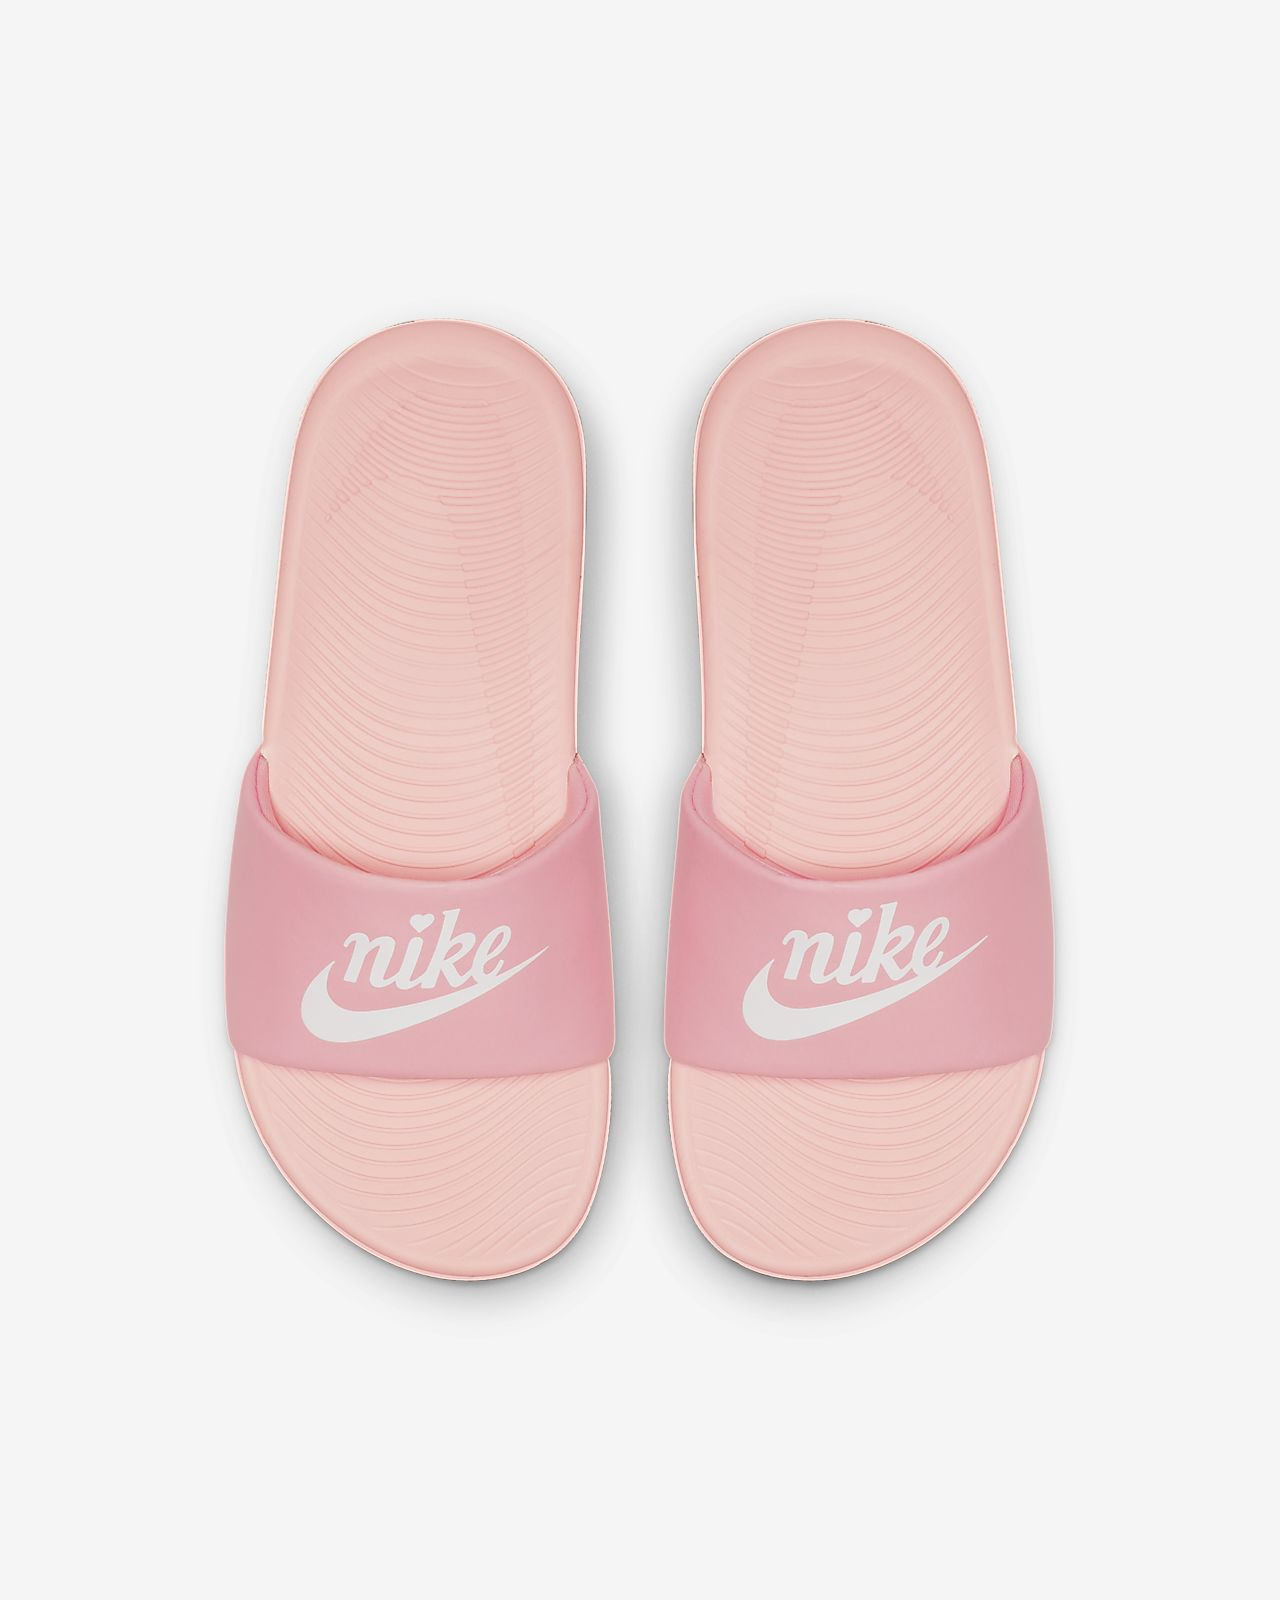 Nike Kawa Slide VDAY (GS/PS)大童拖鞋